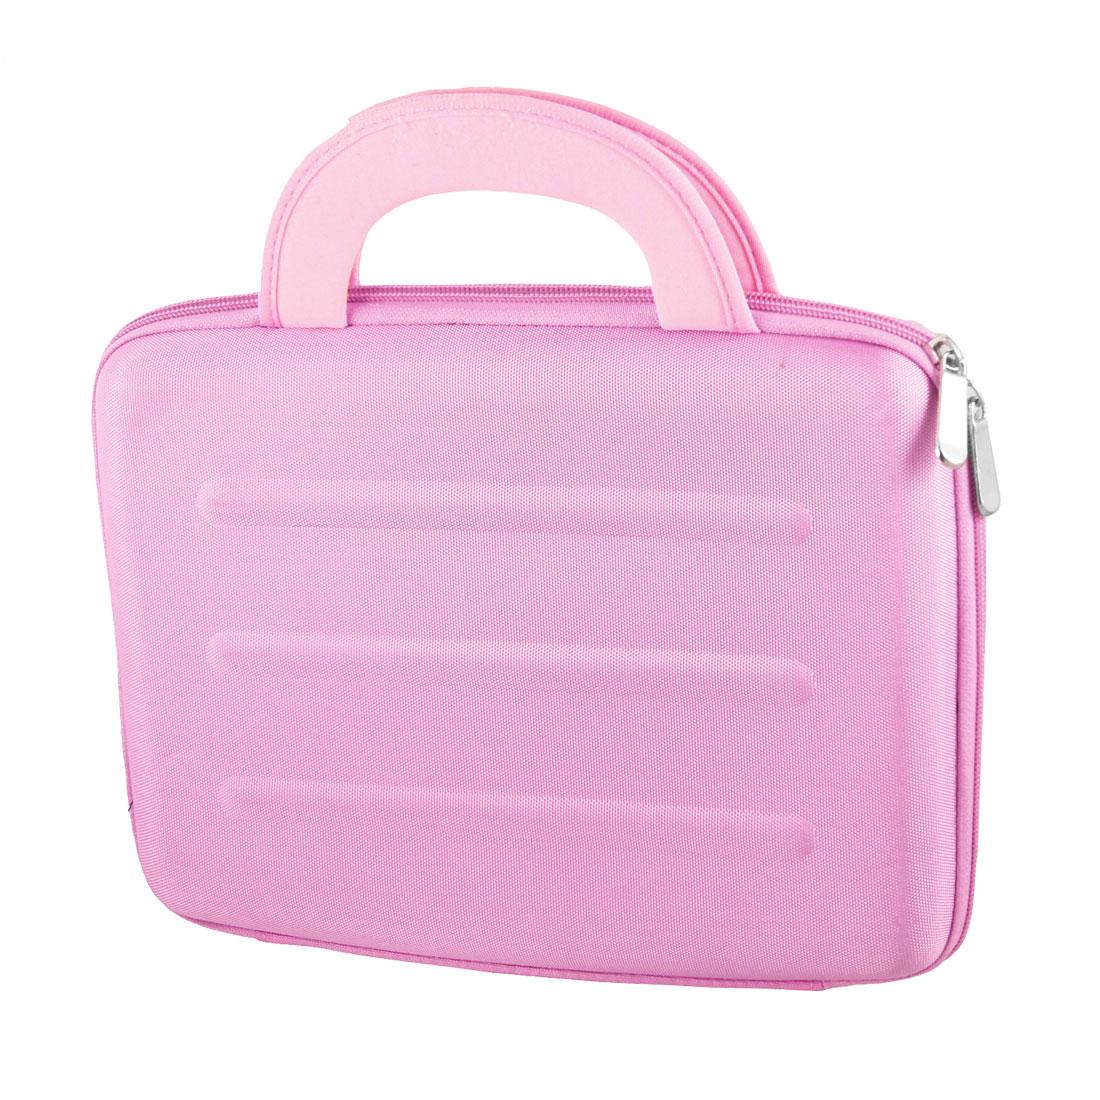 "10"" 10.1"" 10.2"" Pink Laptop Sleeve Bag w Handle"